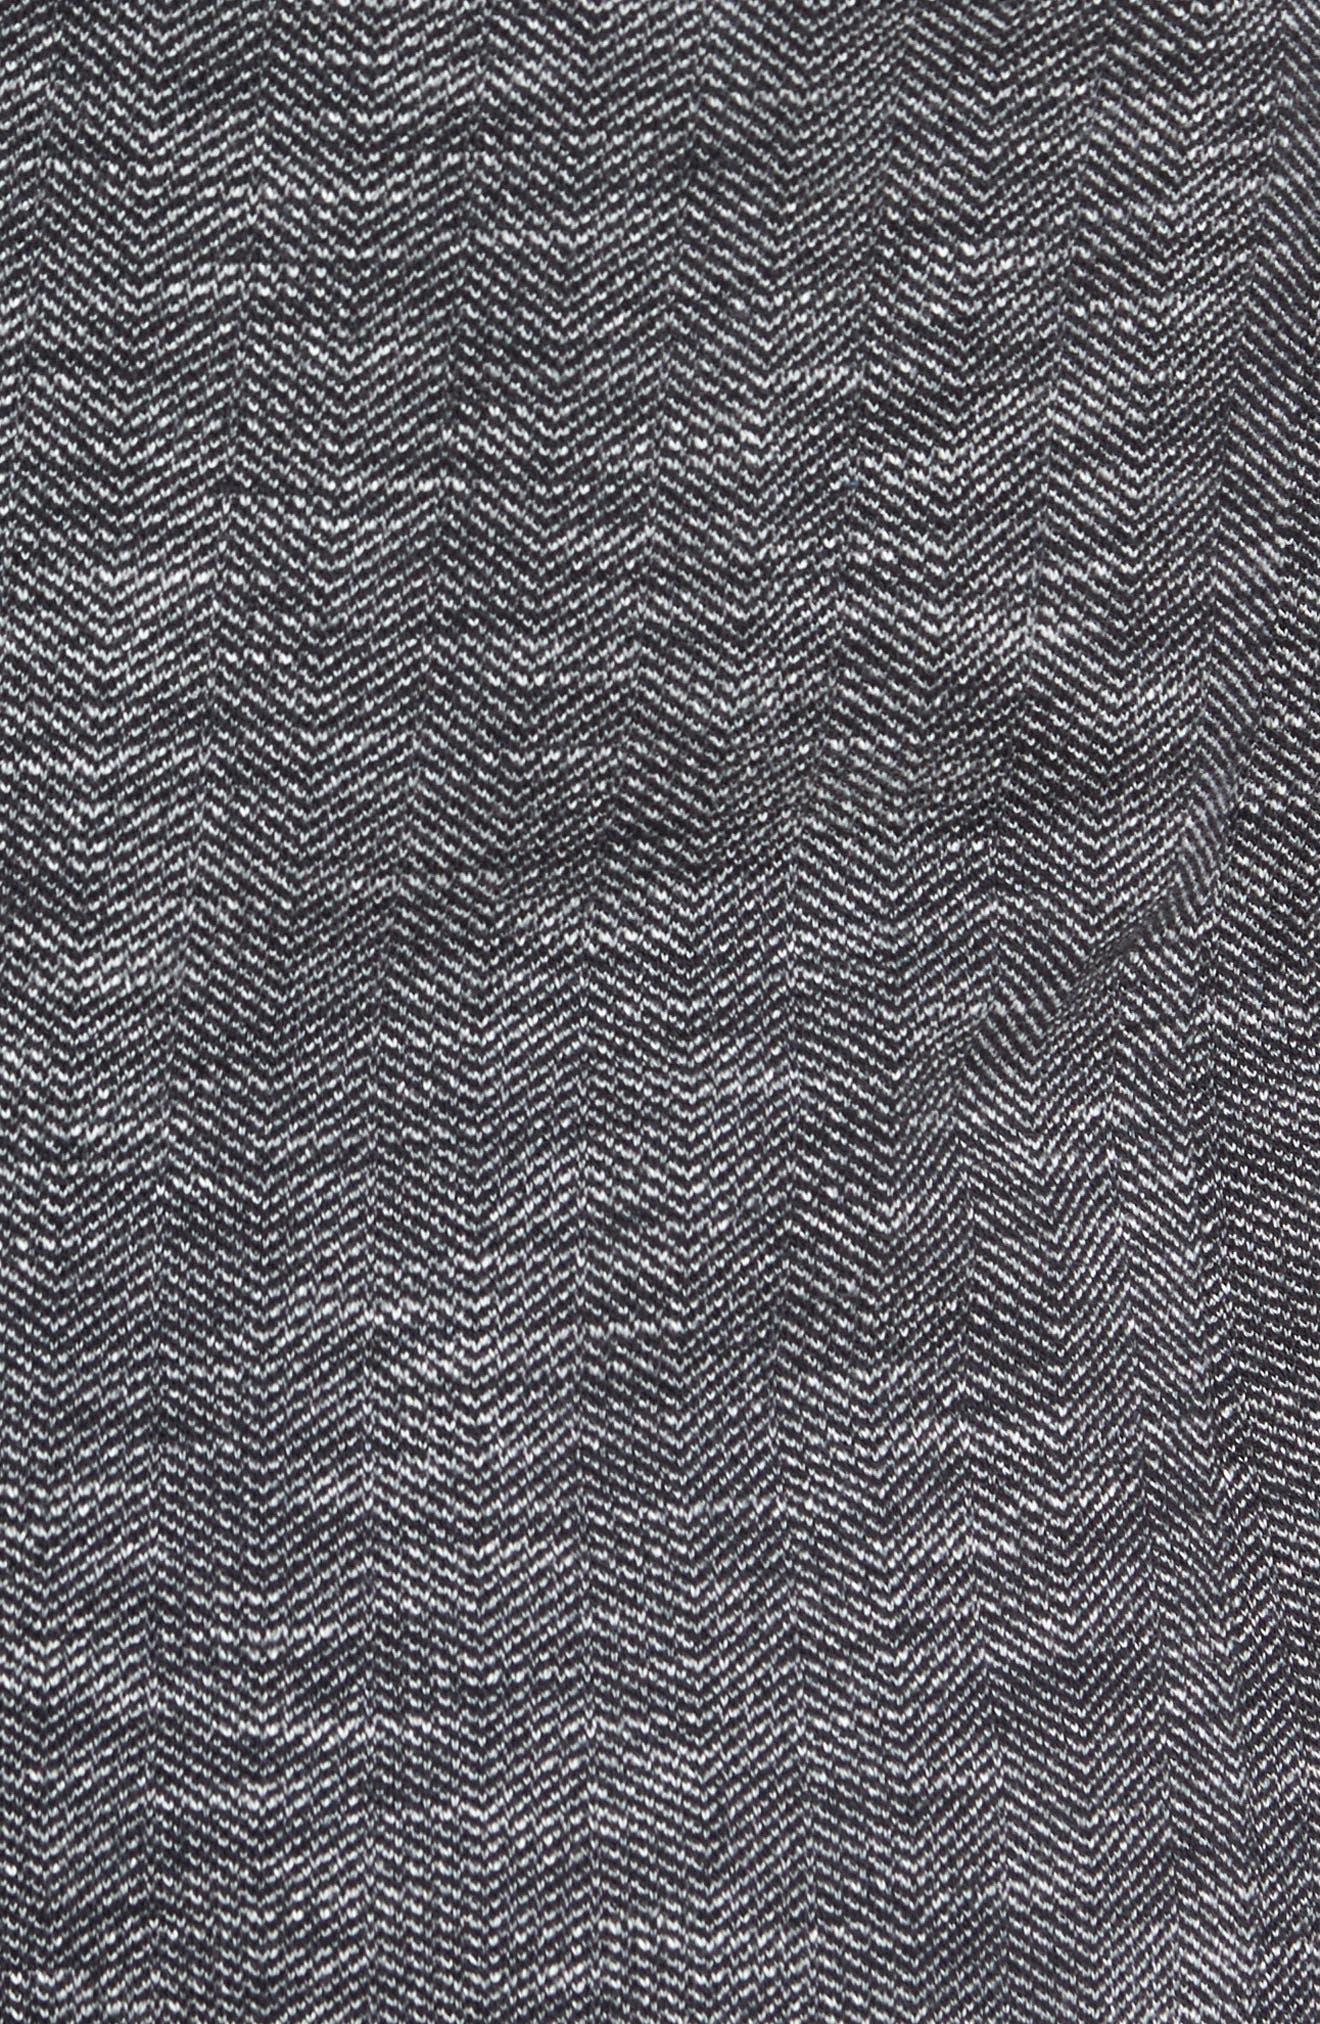 Slim Fit Vintage Herringbone Knit Blazer,                             Alternate thumbnail 6, color,